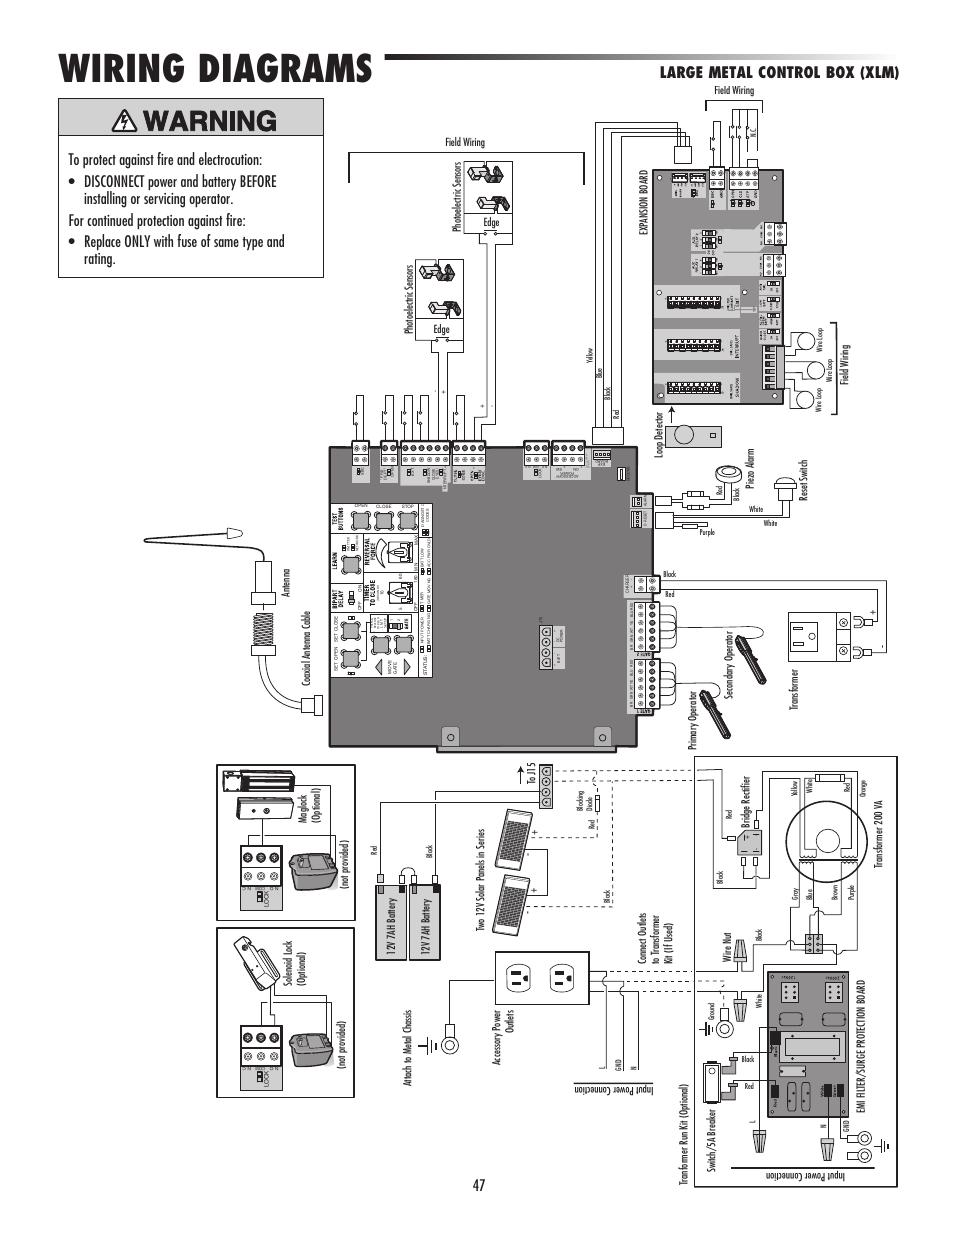 lift master garage door wiring diagram repair redondo beach control for universal swing gate portal genie opener controls